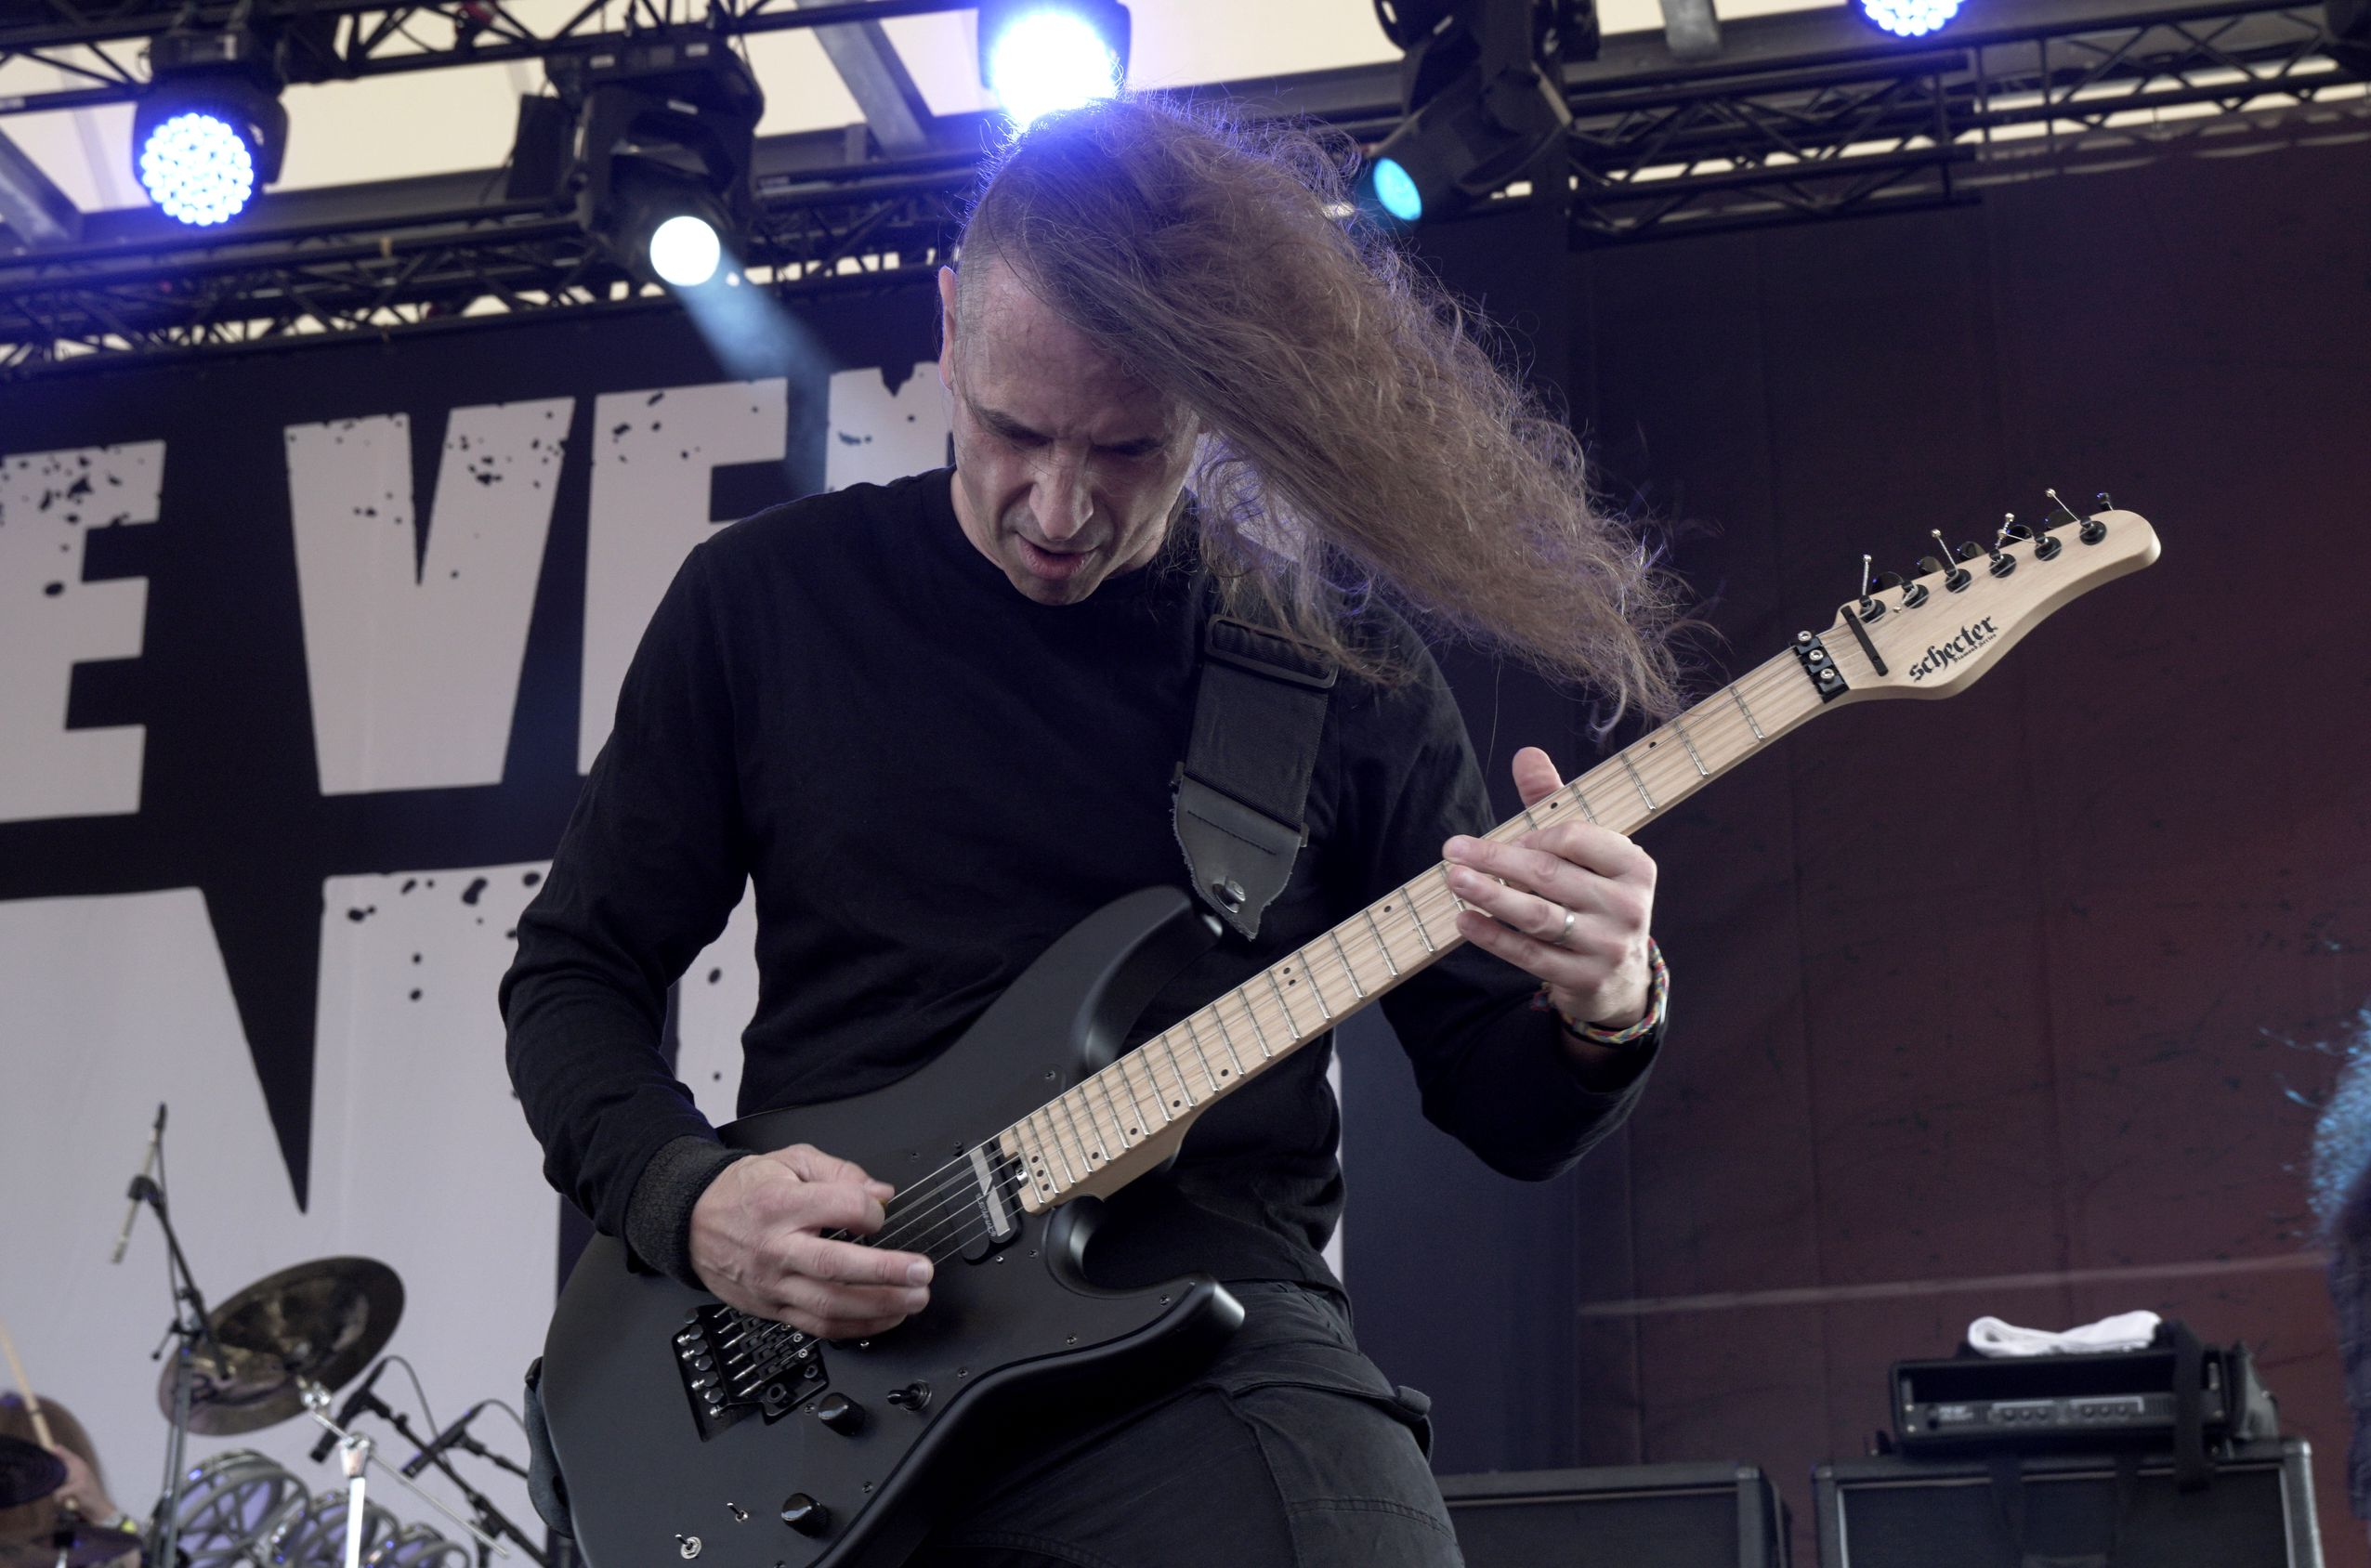 Rock-Hard-Festival-2021-One-Day-The-Very-End-Asphyx-Rage-Motorjesus-Wolfskull-Darkness-Scorched-Oak-Amphitheater-Gelsenkirchen_8